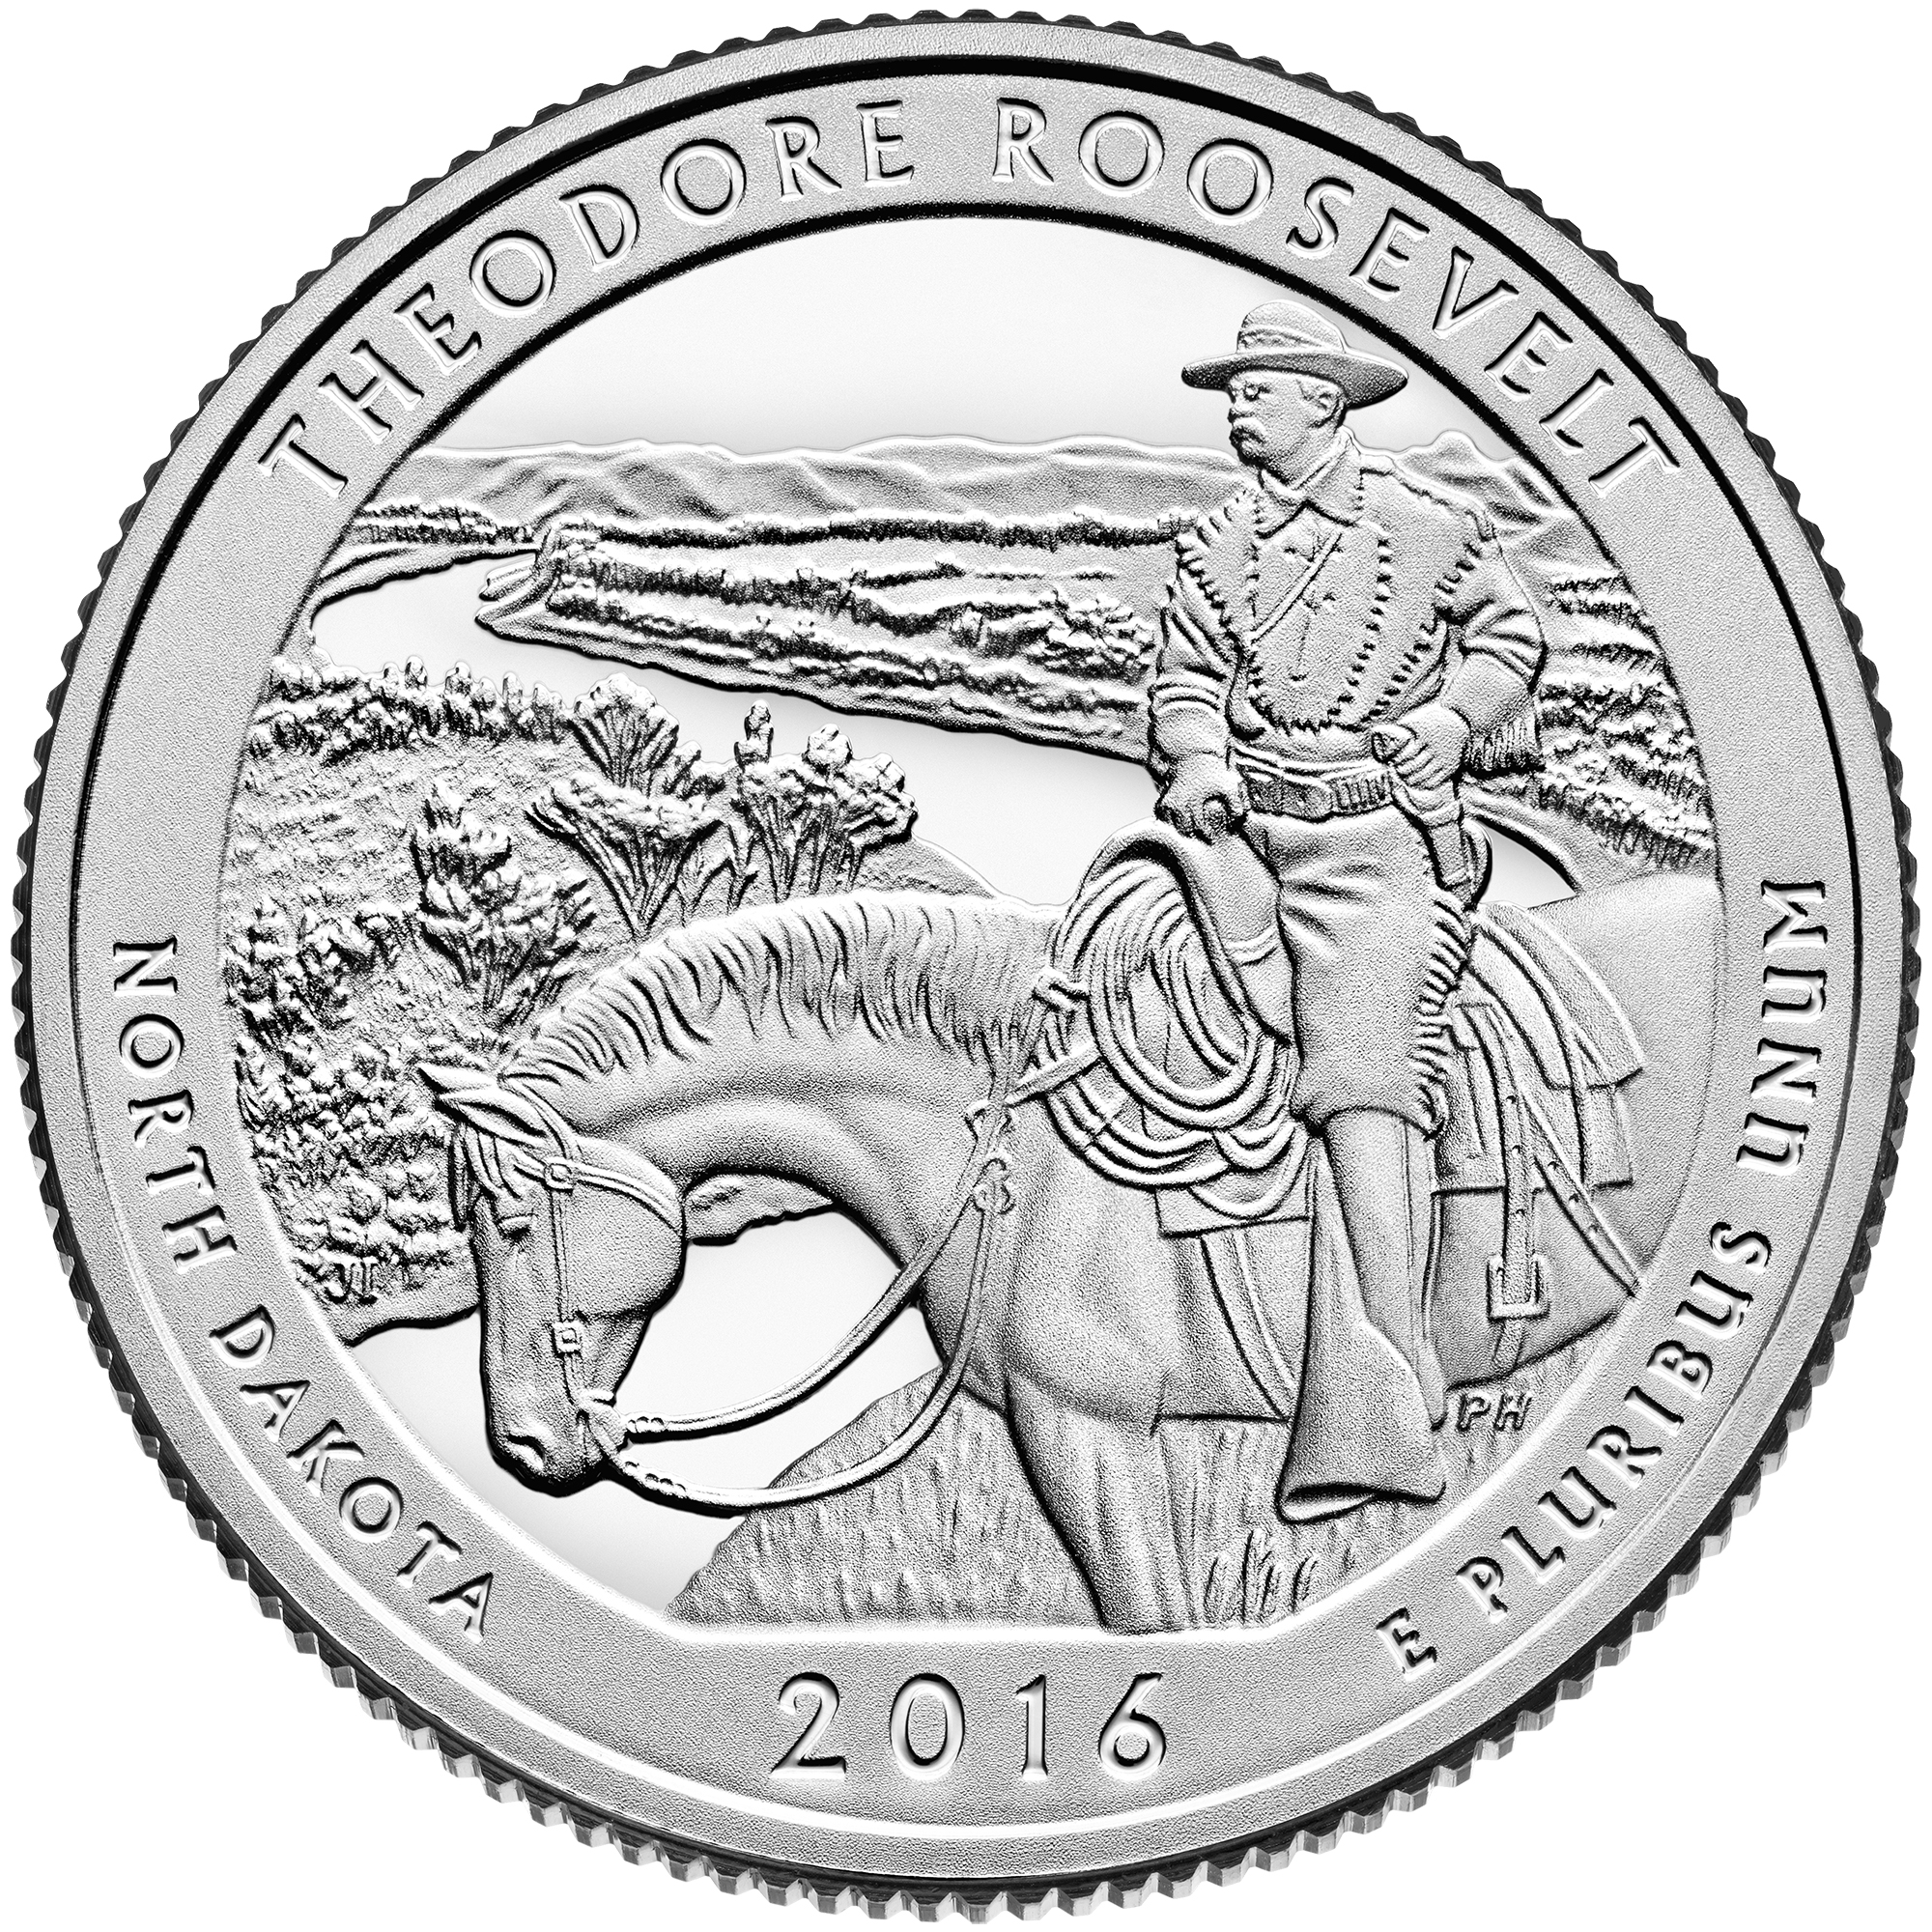 2016 America The Beautiful Quarters Coin Theodore Roosevelt North Dakota Proof Reverse